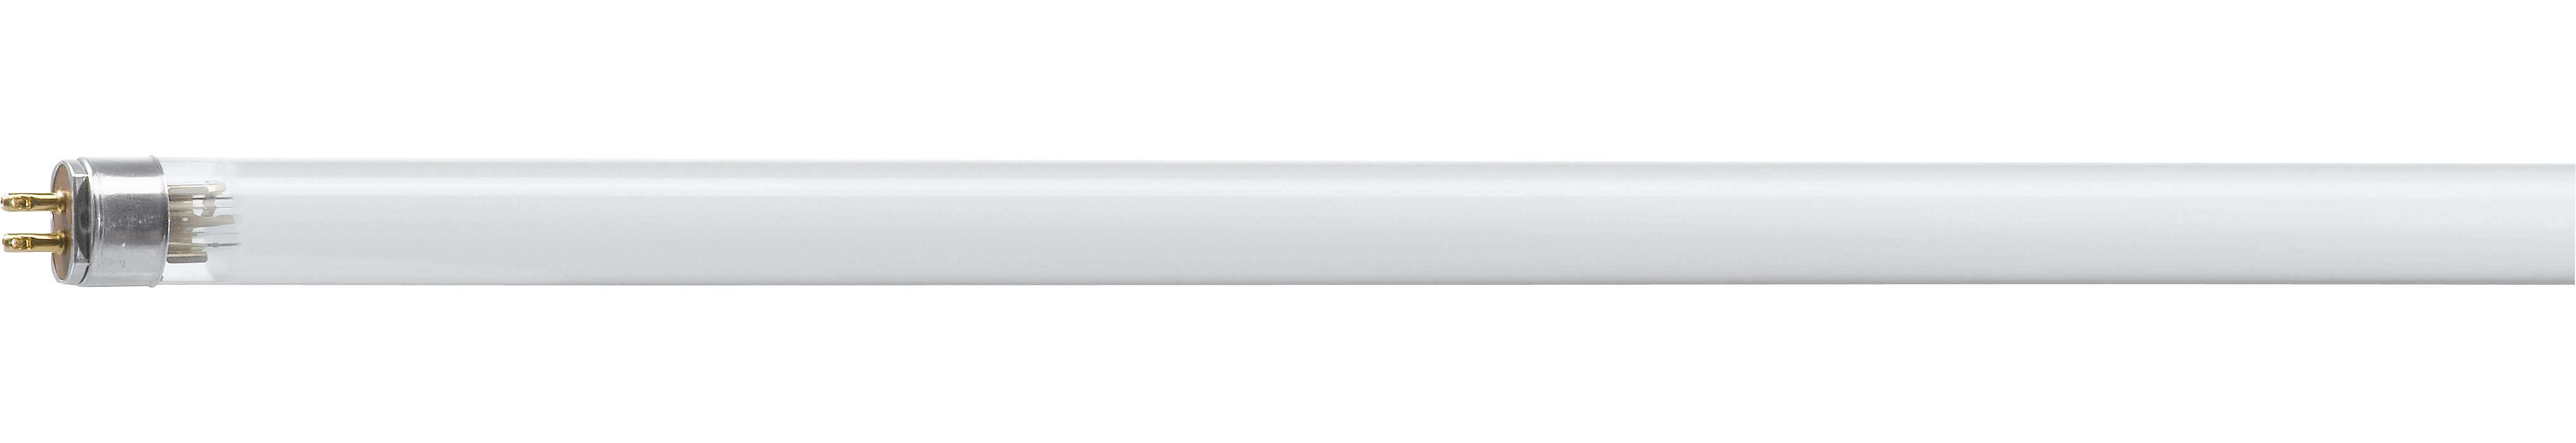 Temperature independent fluorescent lighting